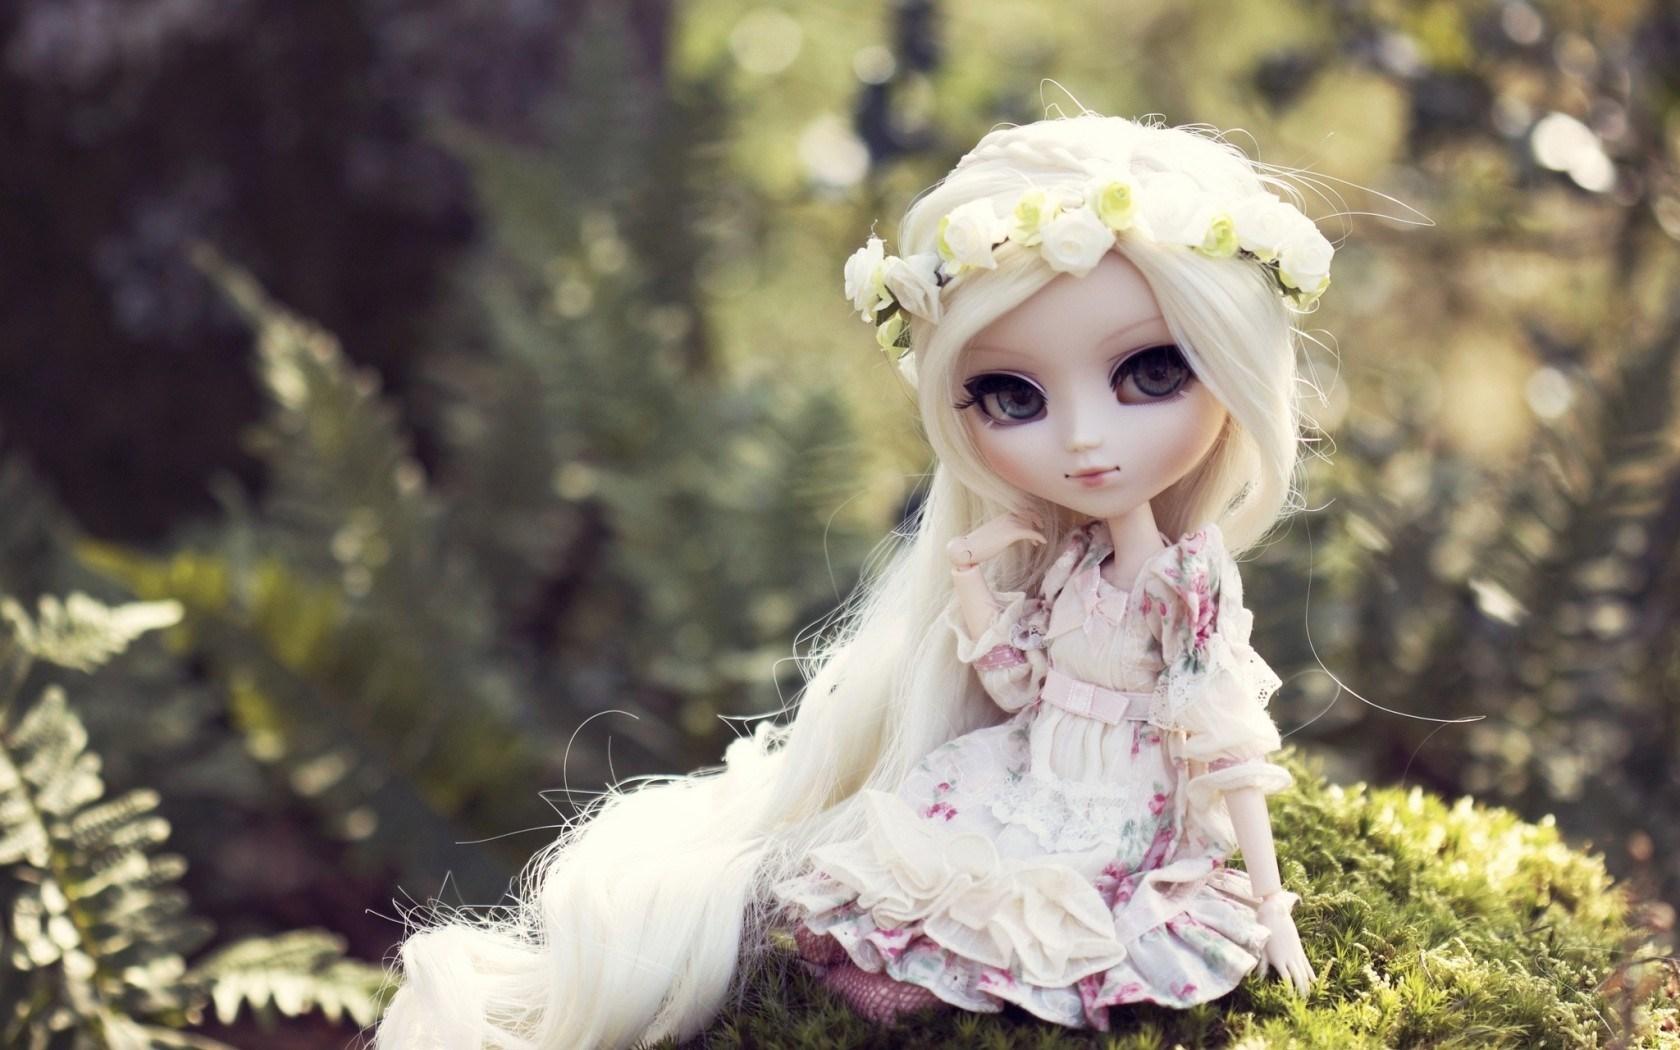 Toy Doll Blonde Hair Wallpaper